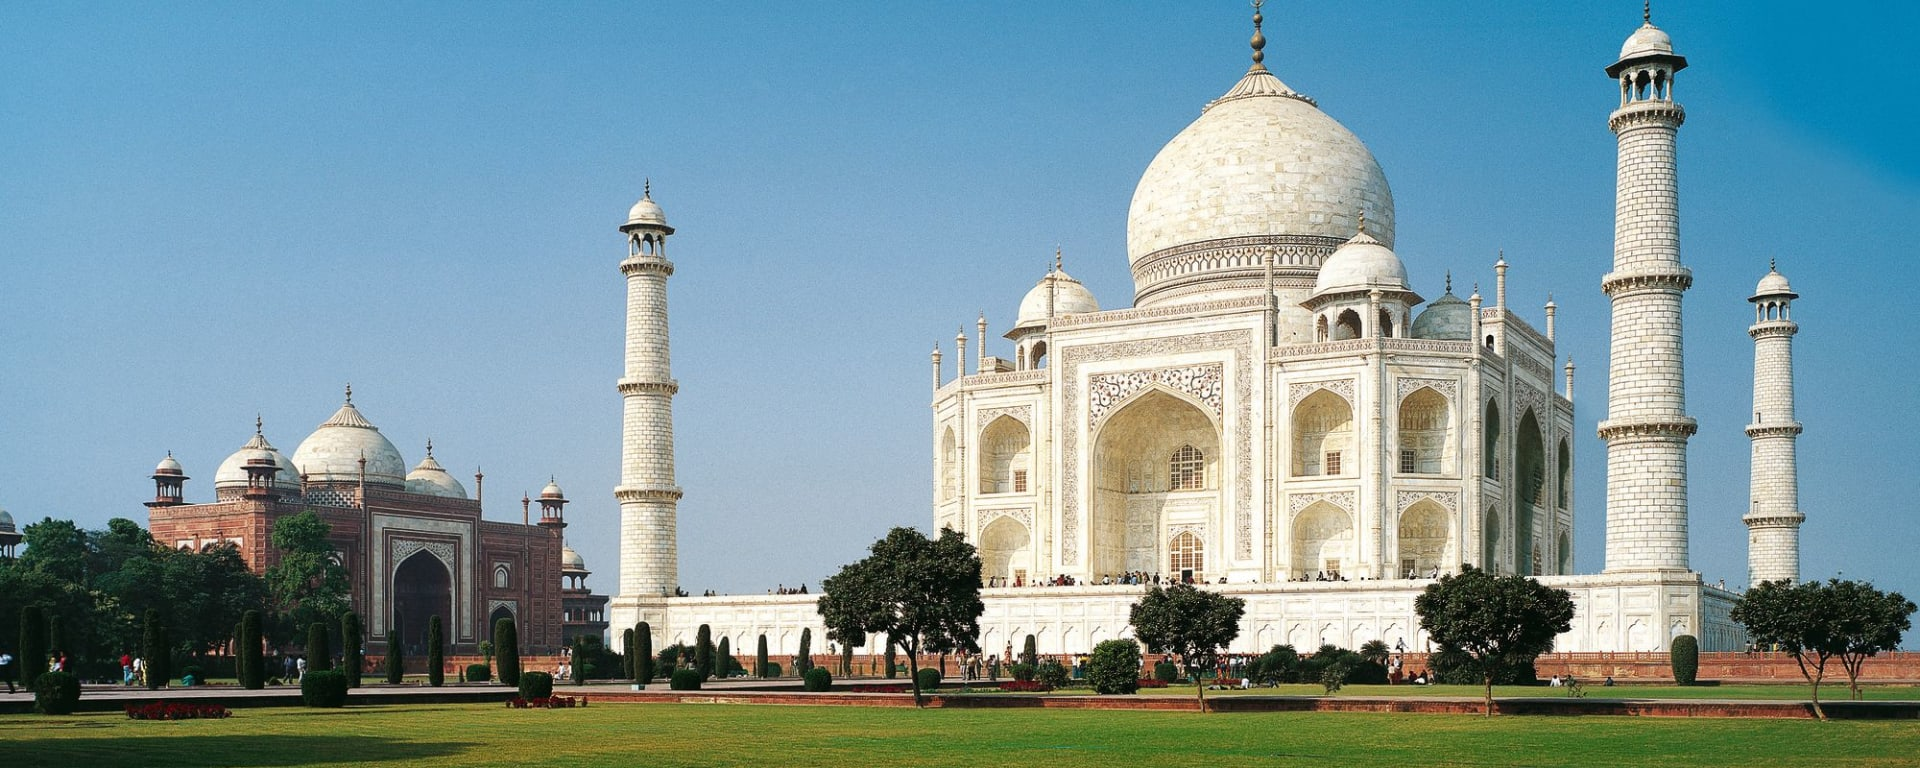 «The Deccan Odyssey» - Im Land der Könige ab Delhi: Agra Taj Mahal